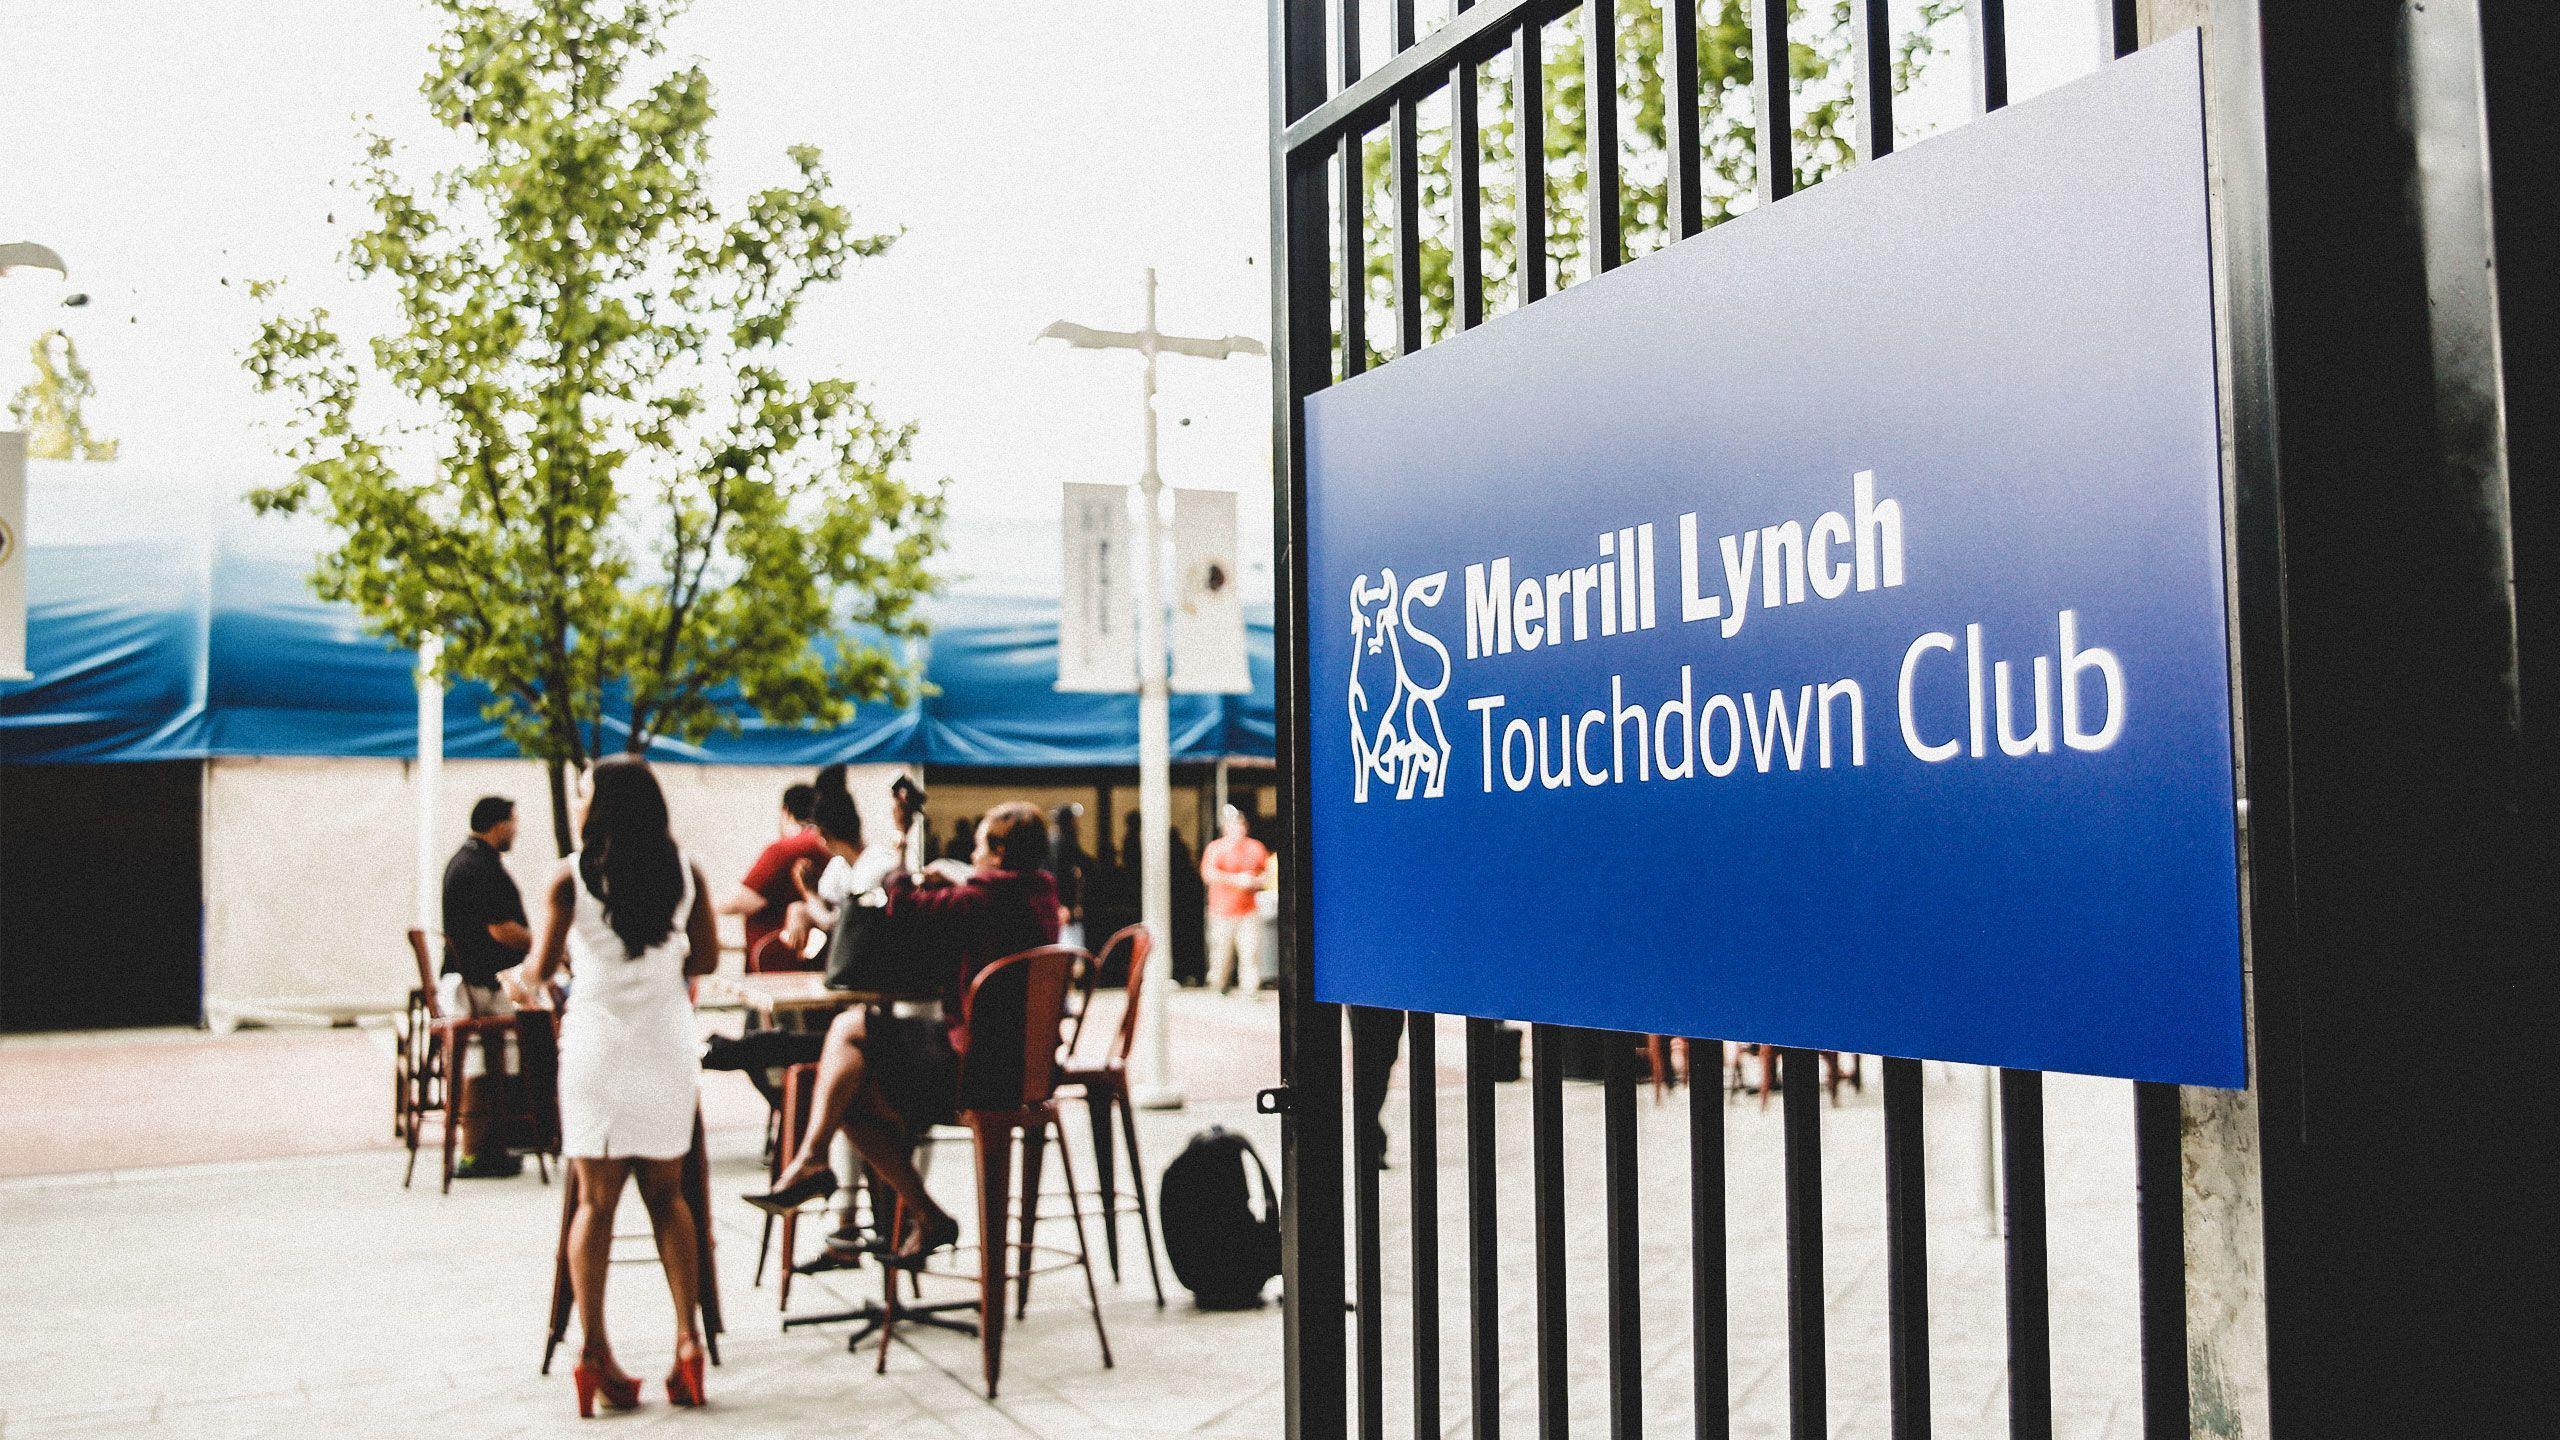 Merrill Lynch Touchdown Club